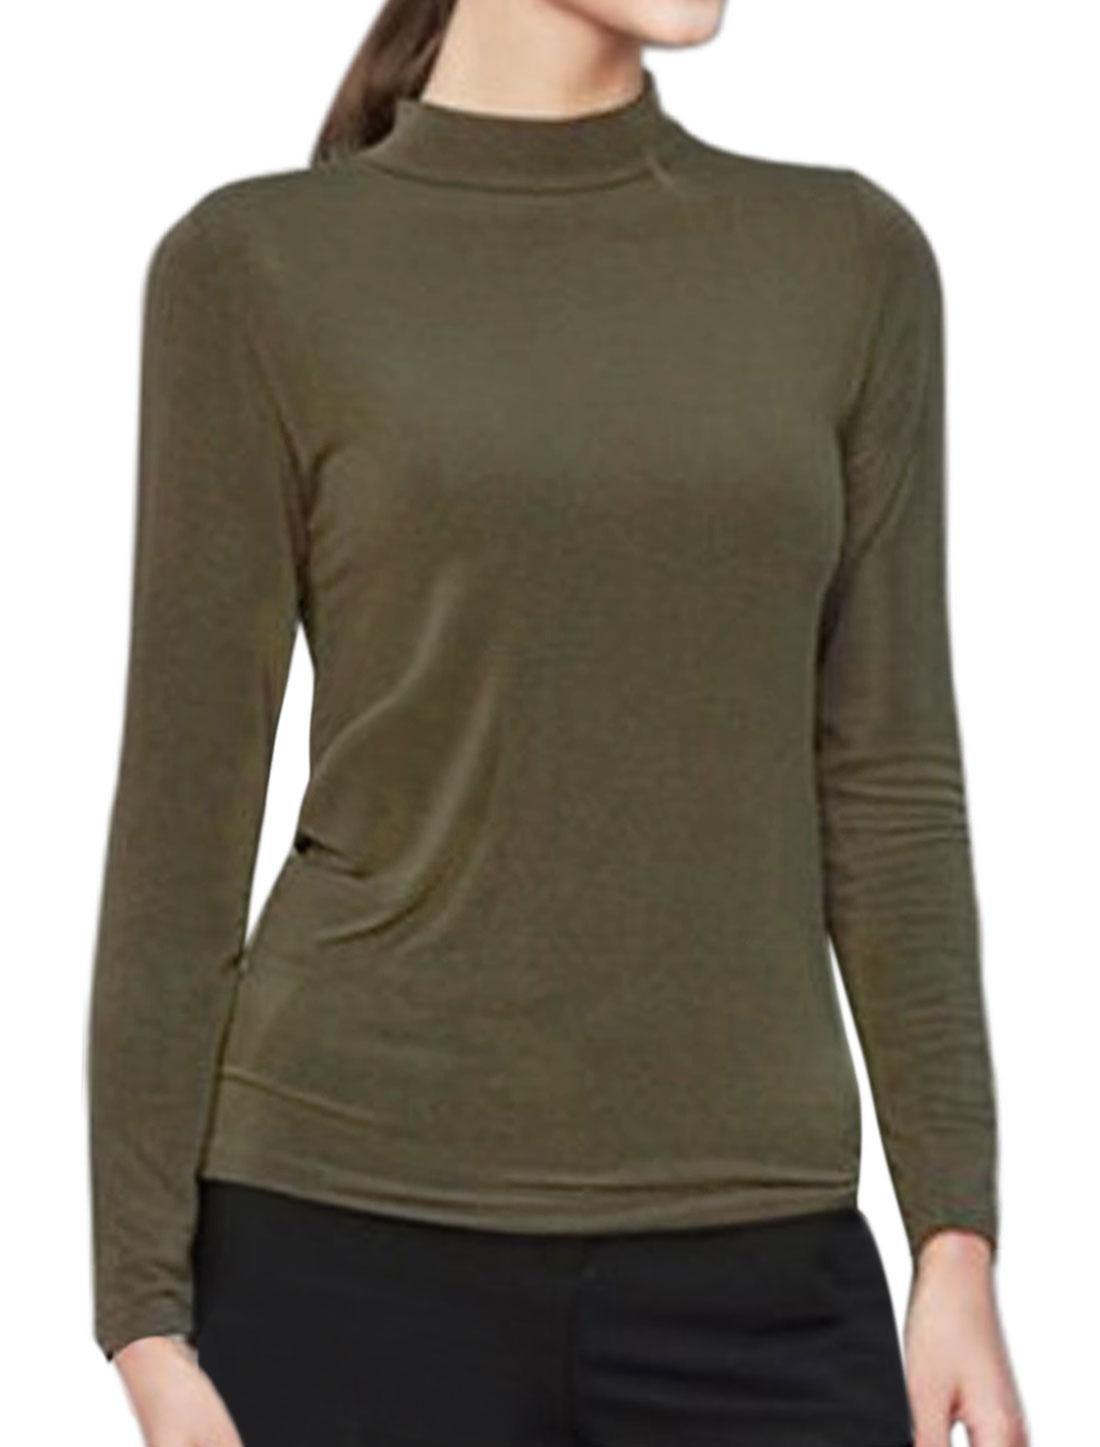 Women Mock Neck Long Sleeves Casual Tee Shirt Green M